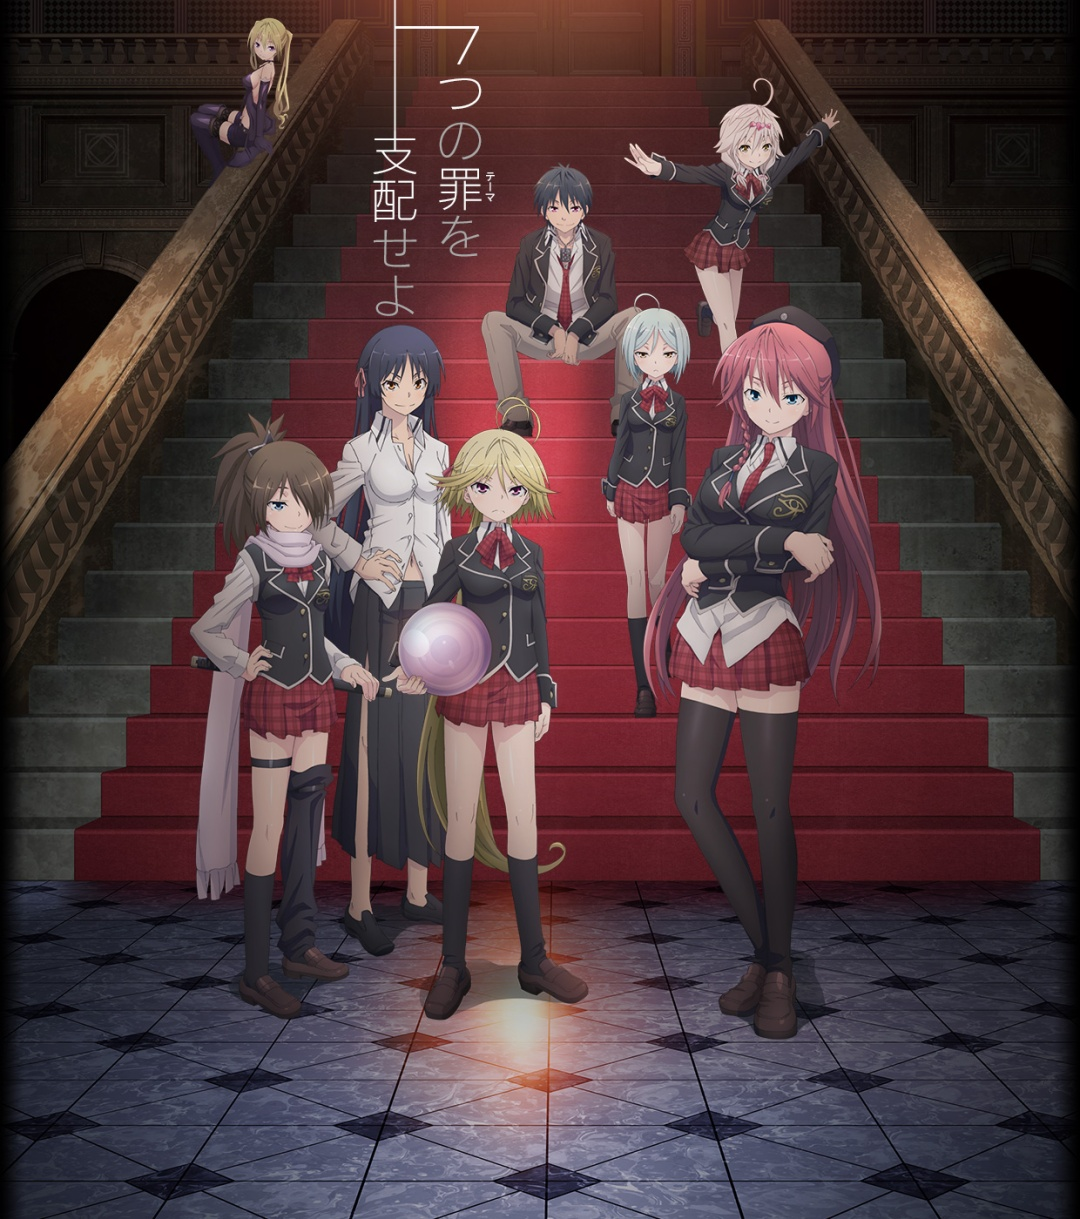 Trinity_Seven_Anime_Poster.jpg